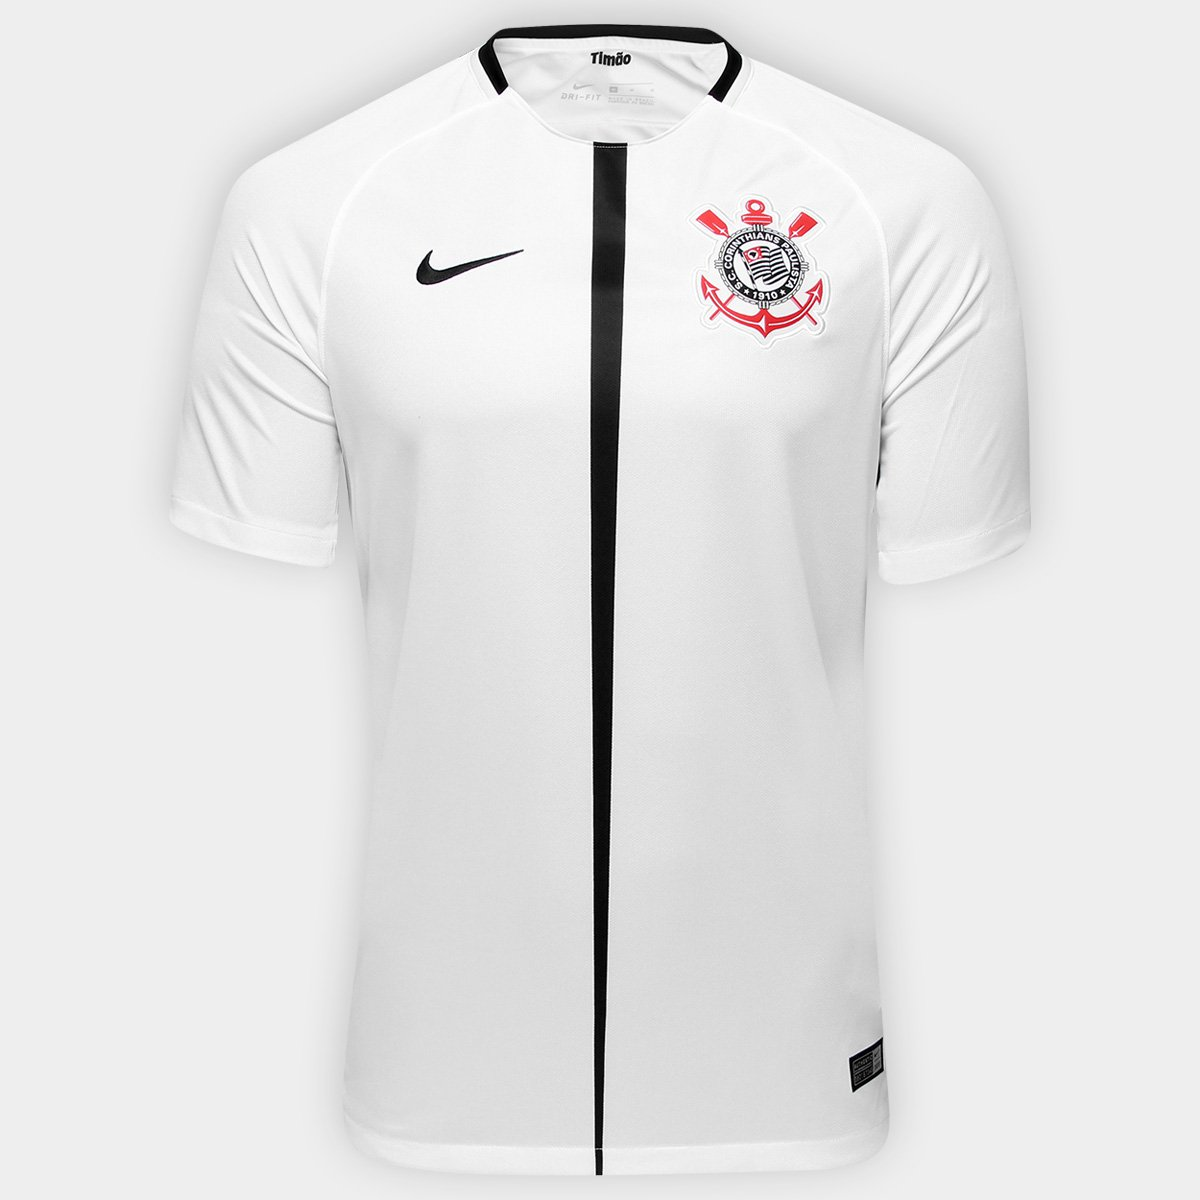 7c75385b4c611 Camisa Corinthians I 17 18 s nº Torcedor Nike Masculina - Compre Agora